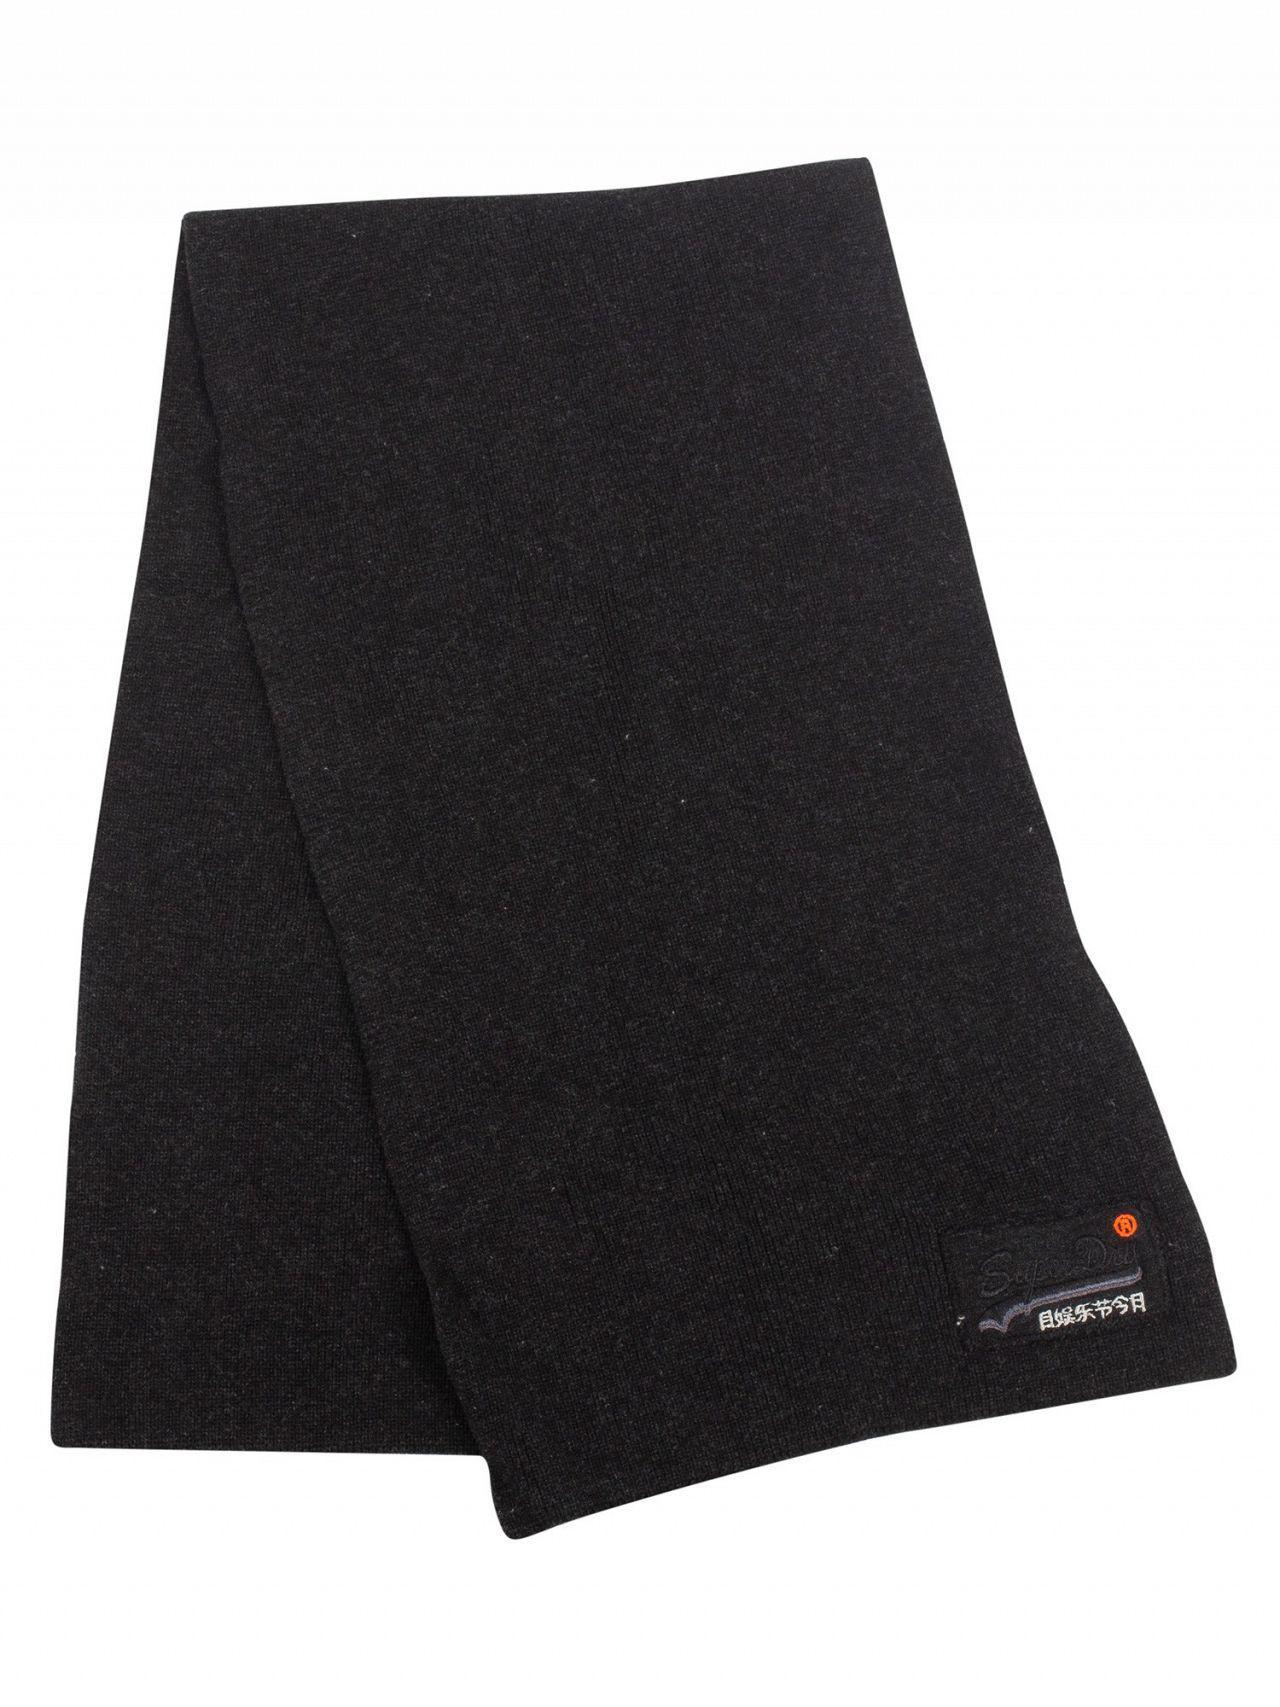 Superdry Men/'s Orange Label Cotton Scarf Black Charcoal Grit One Size